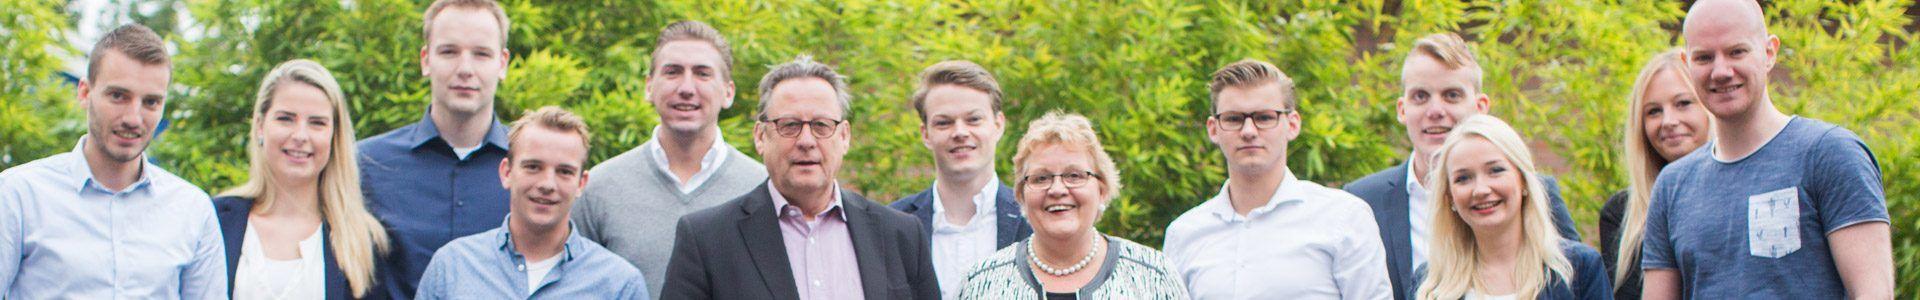 Digital marketingbureau Team Nijhuis Borne